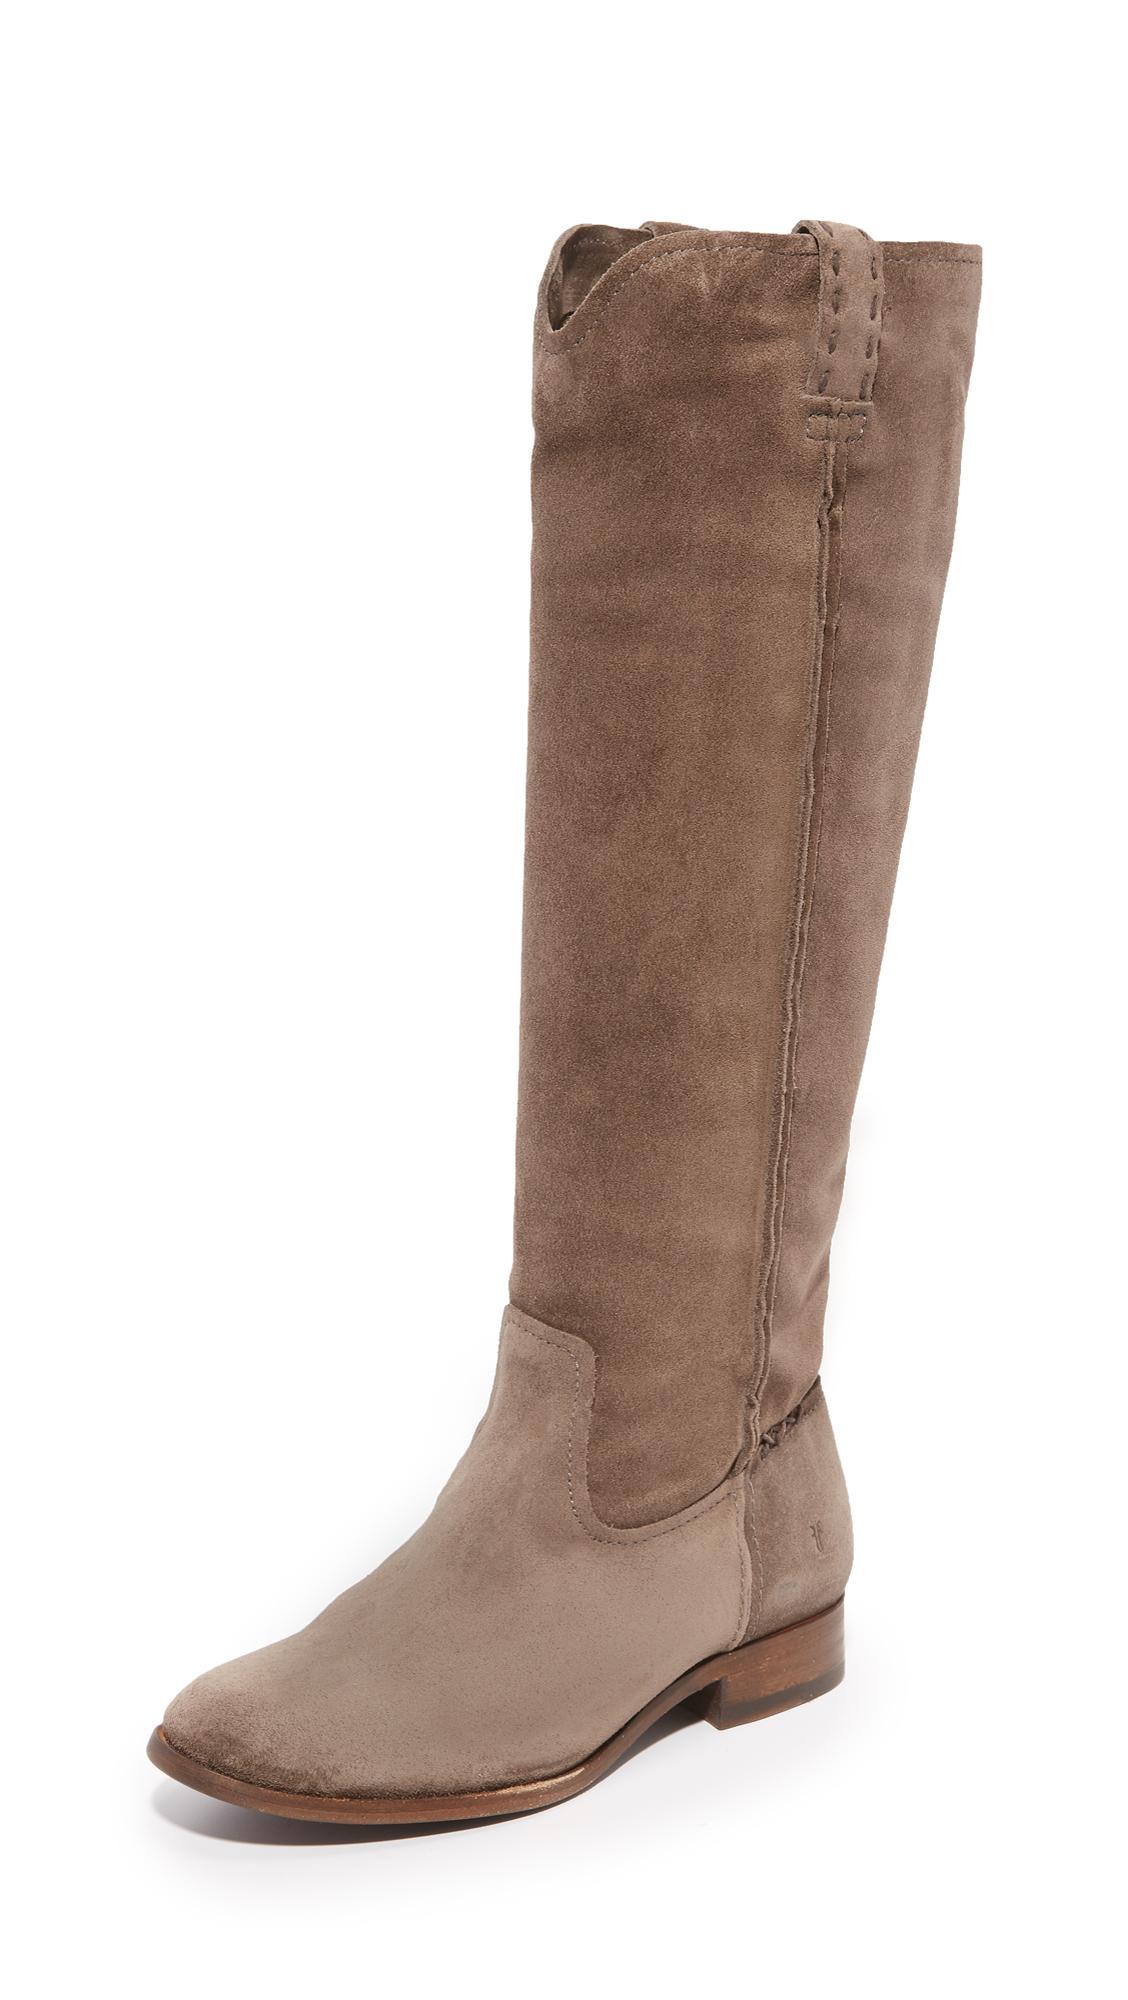 Frye Cara Tall Boots - Elephant